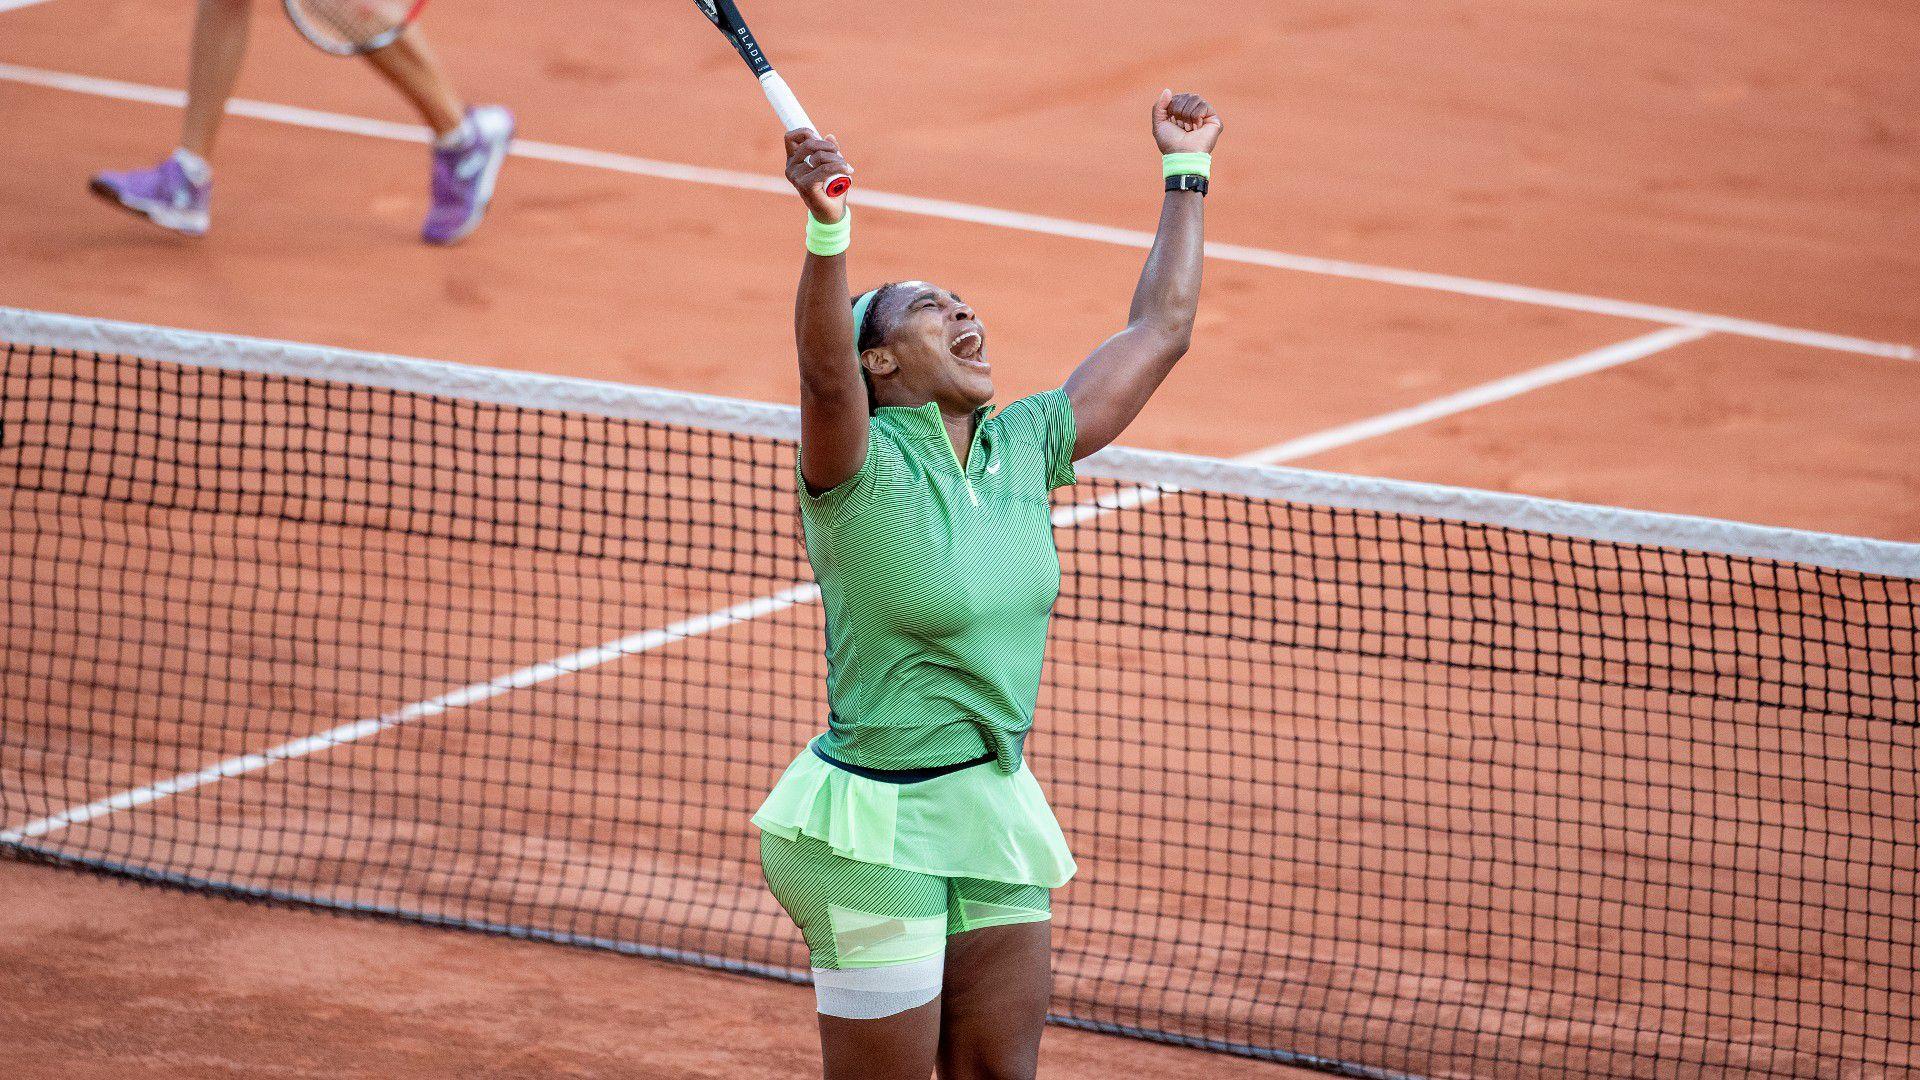 Serena Williams wins in second round at Roland Garros, surviving tough three-setter